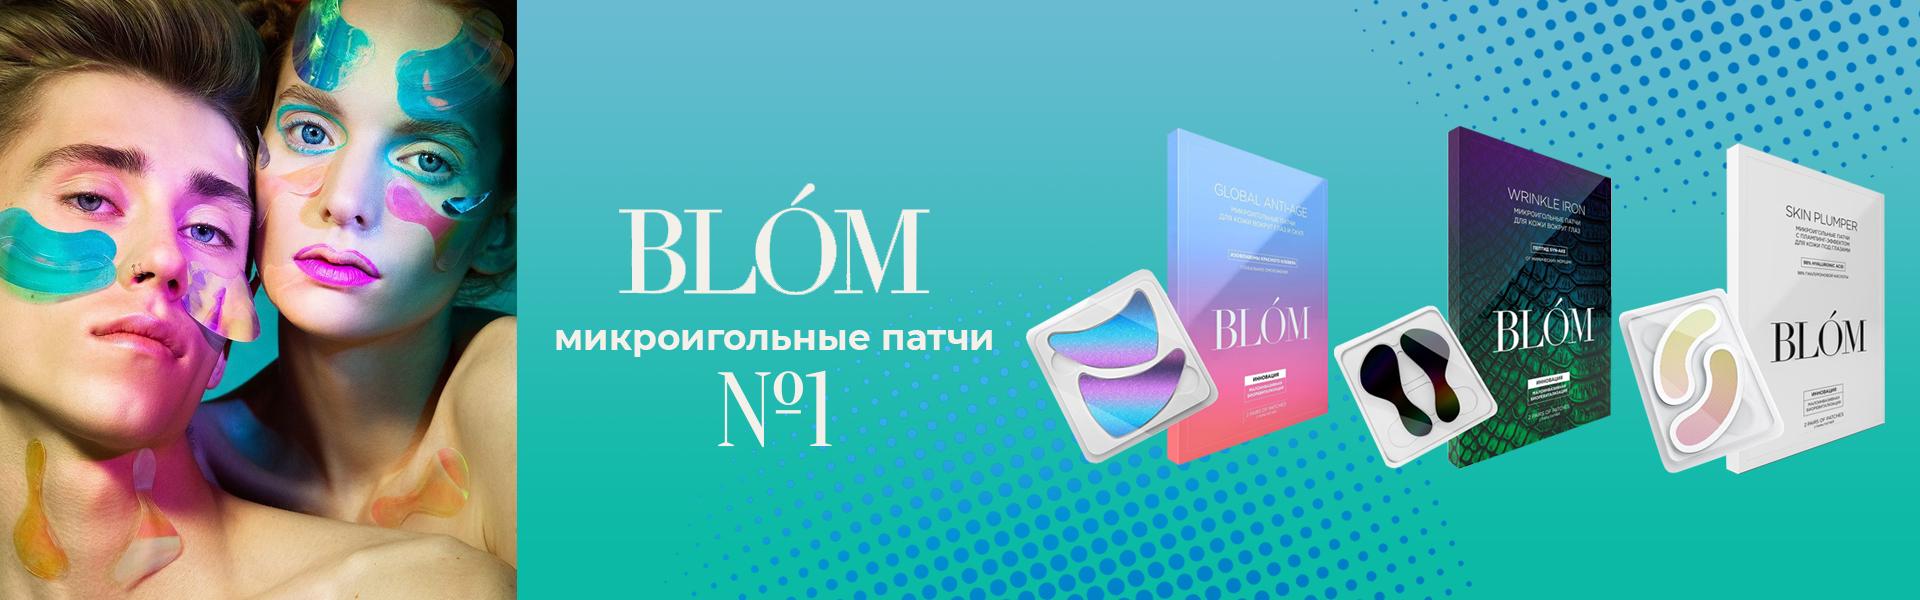 Микроиглы Blom